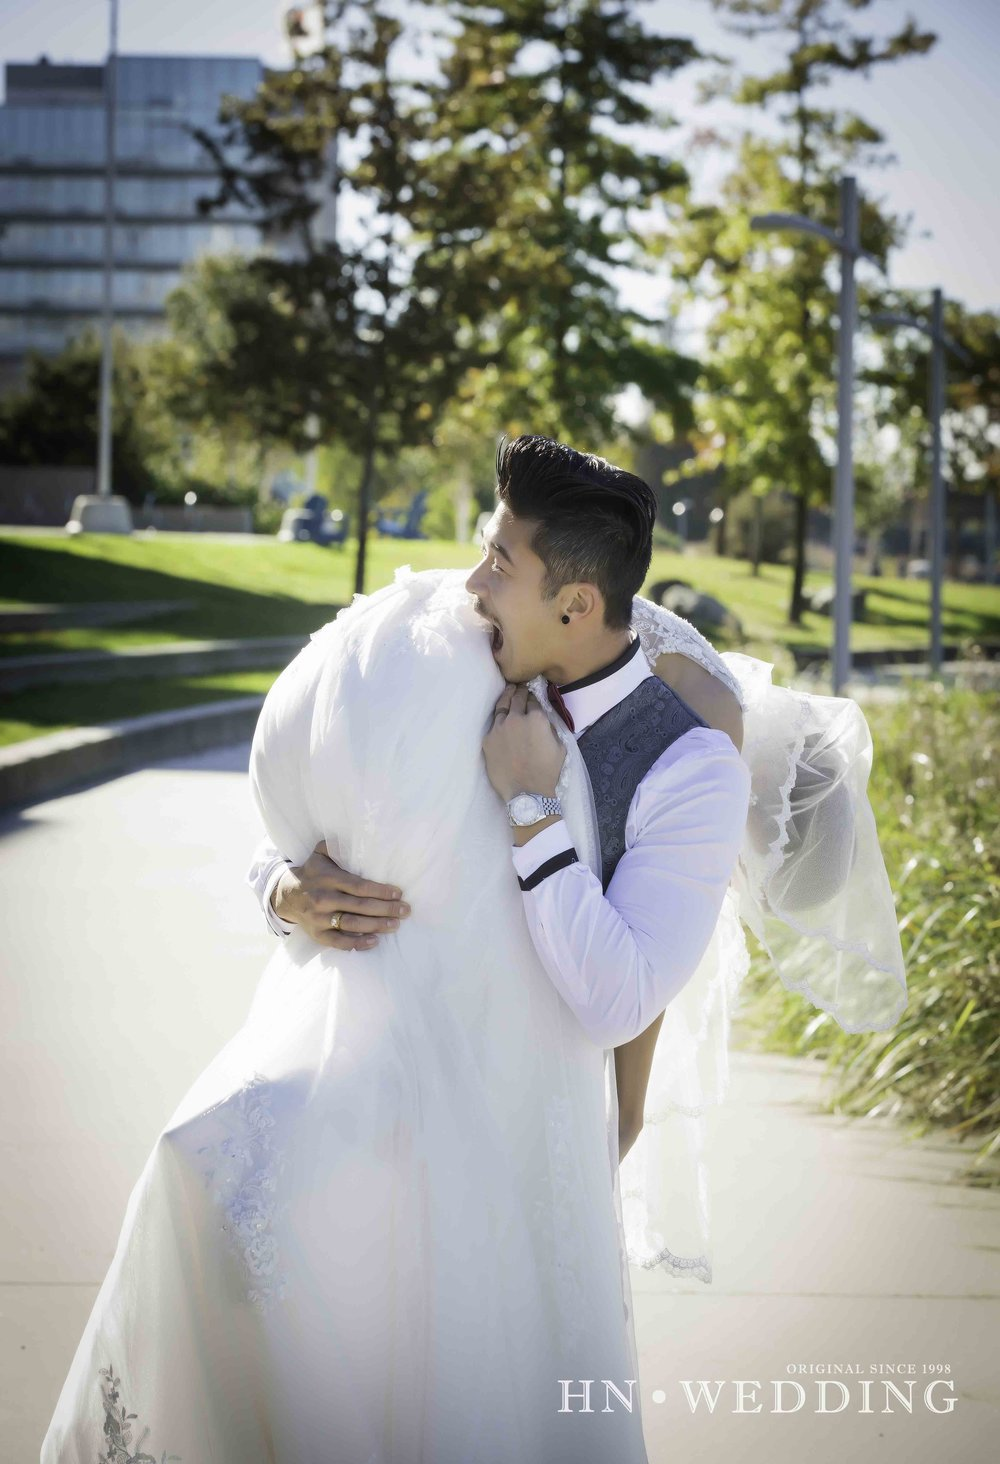 HNwedding-20160815-wedding-028.jpg